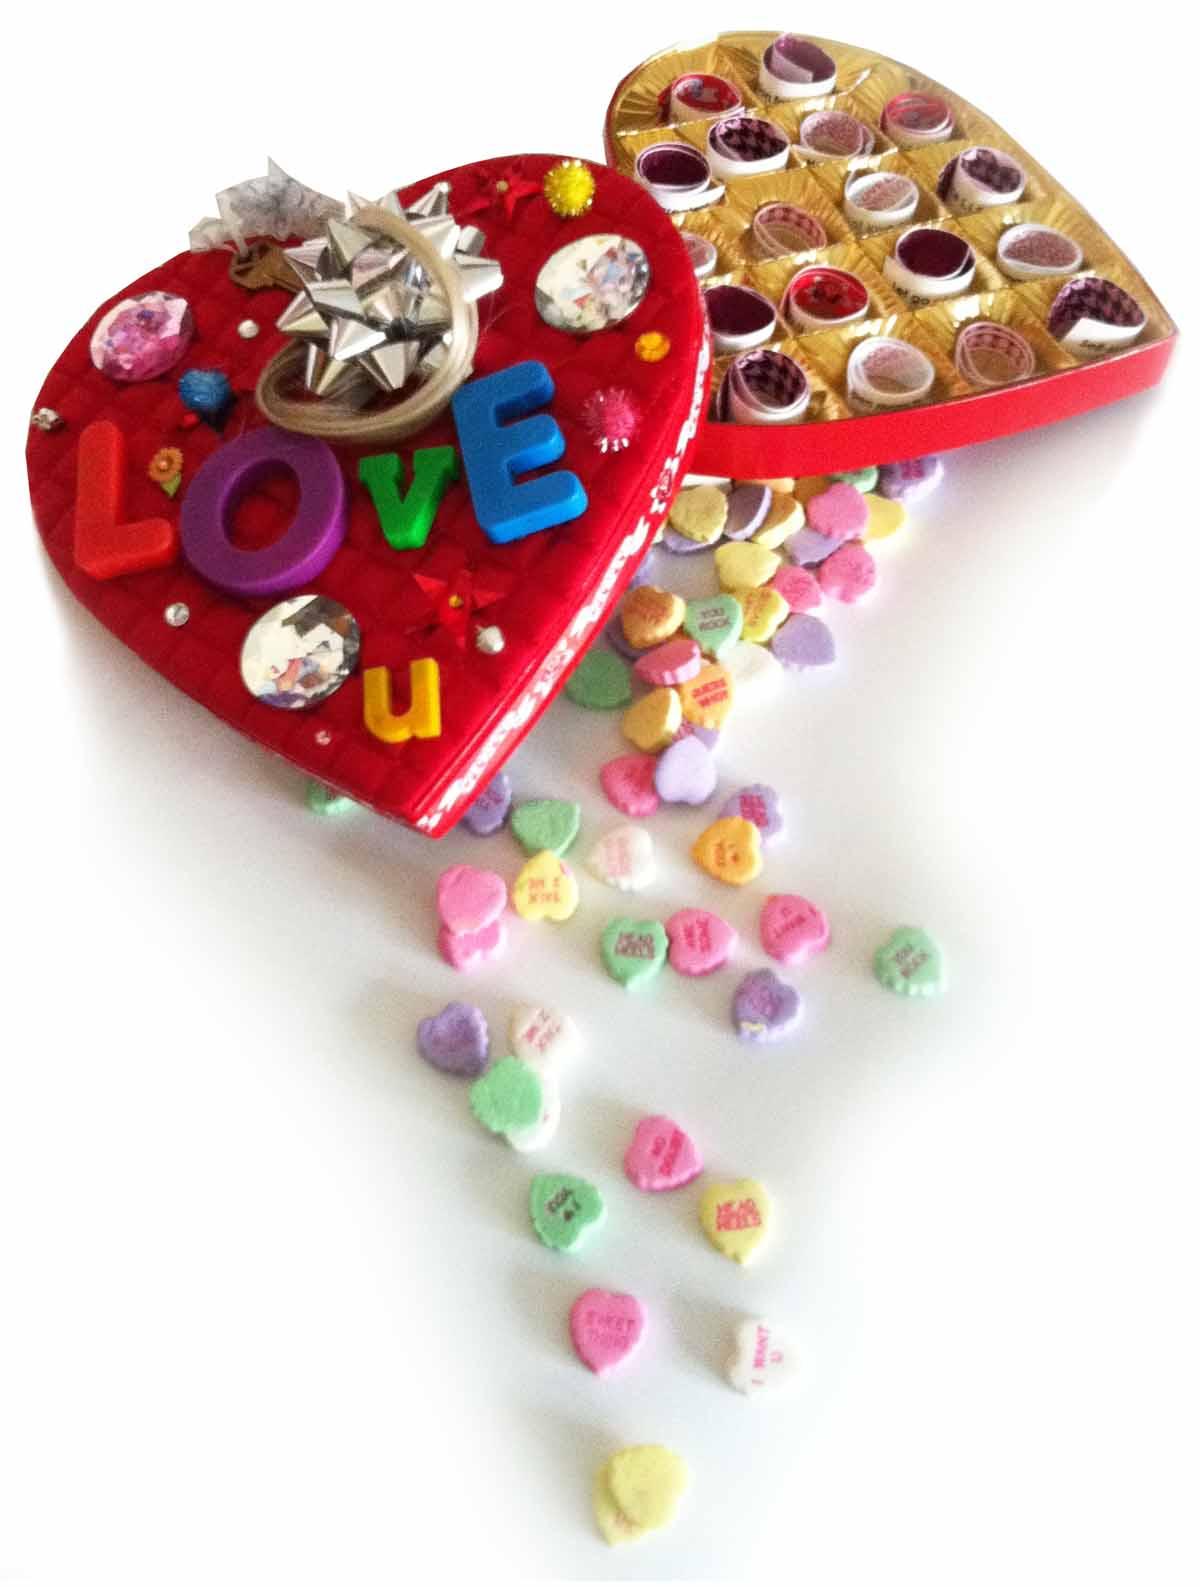 Love-Feeding-Image-to-send.jpg